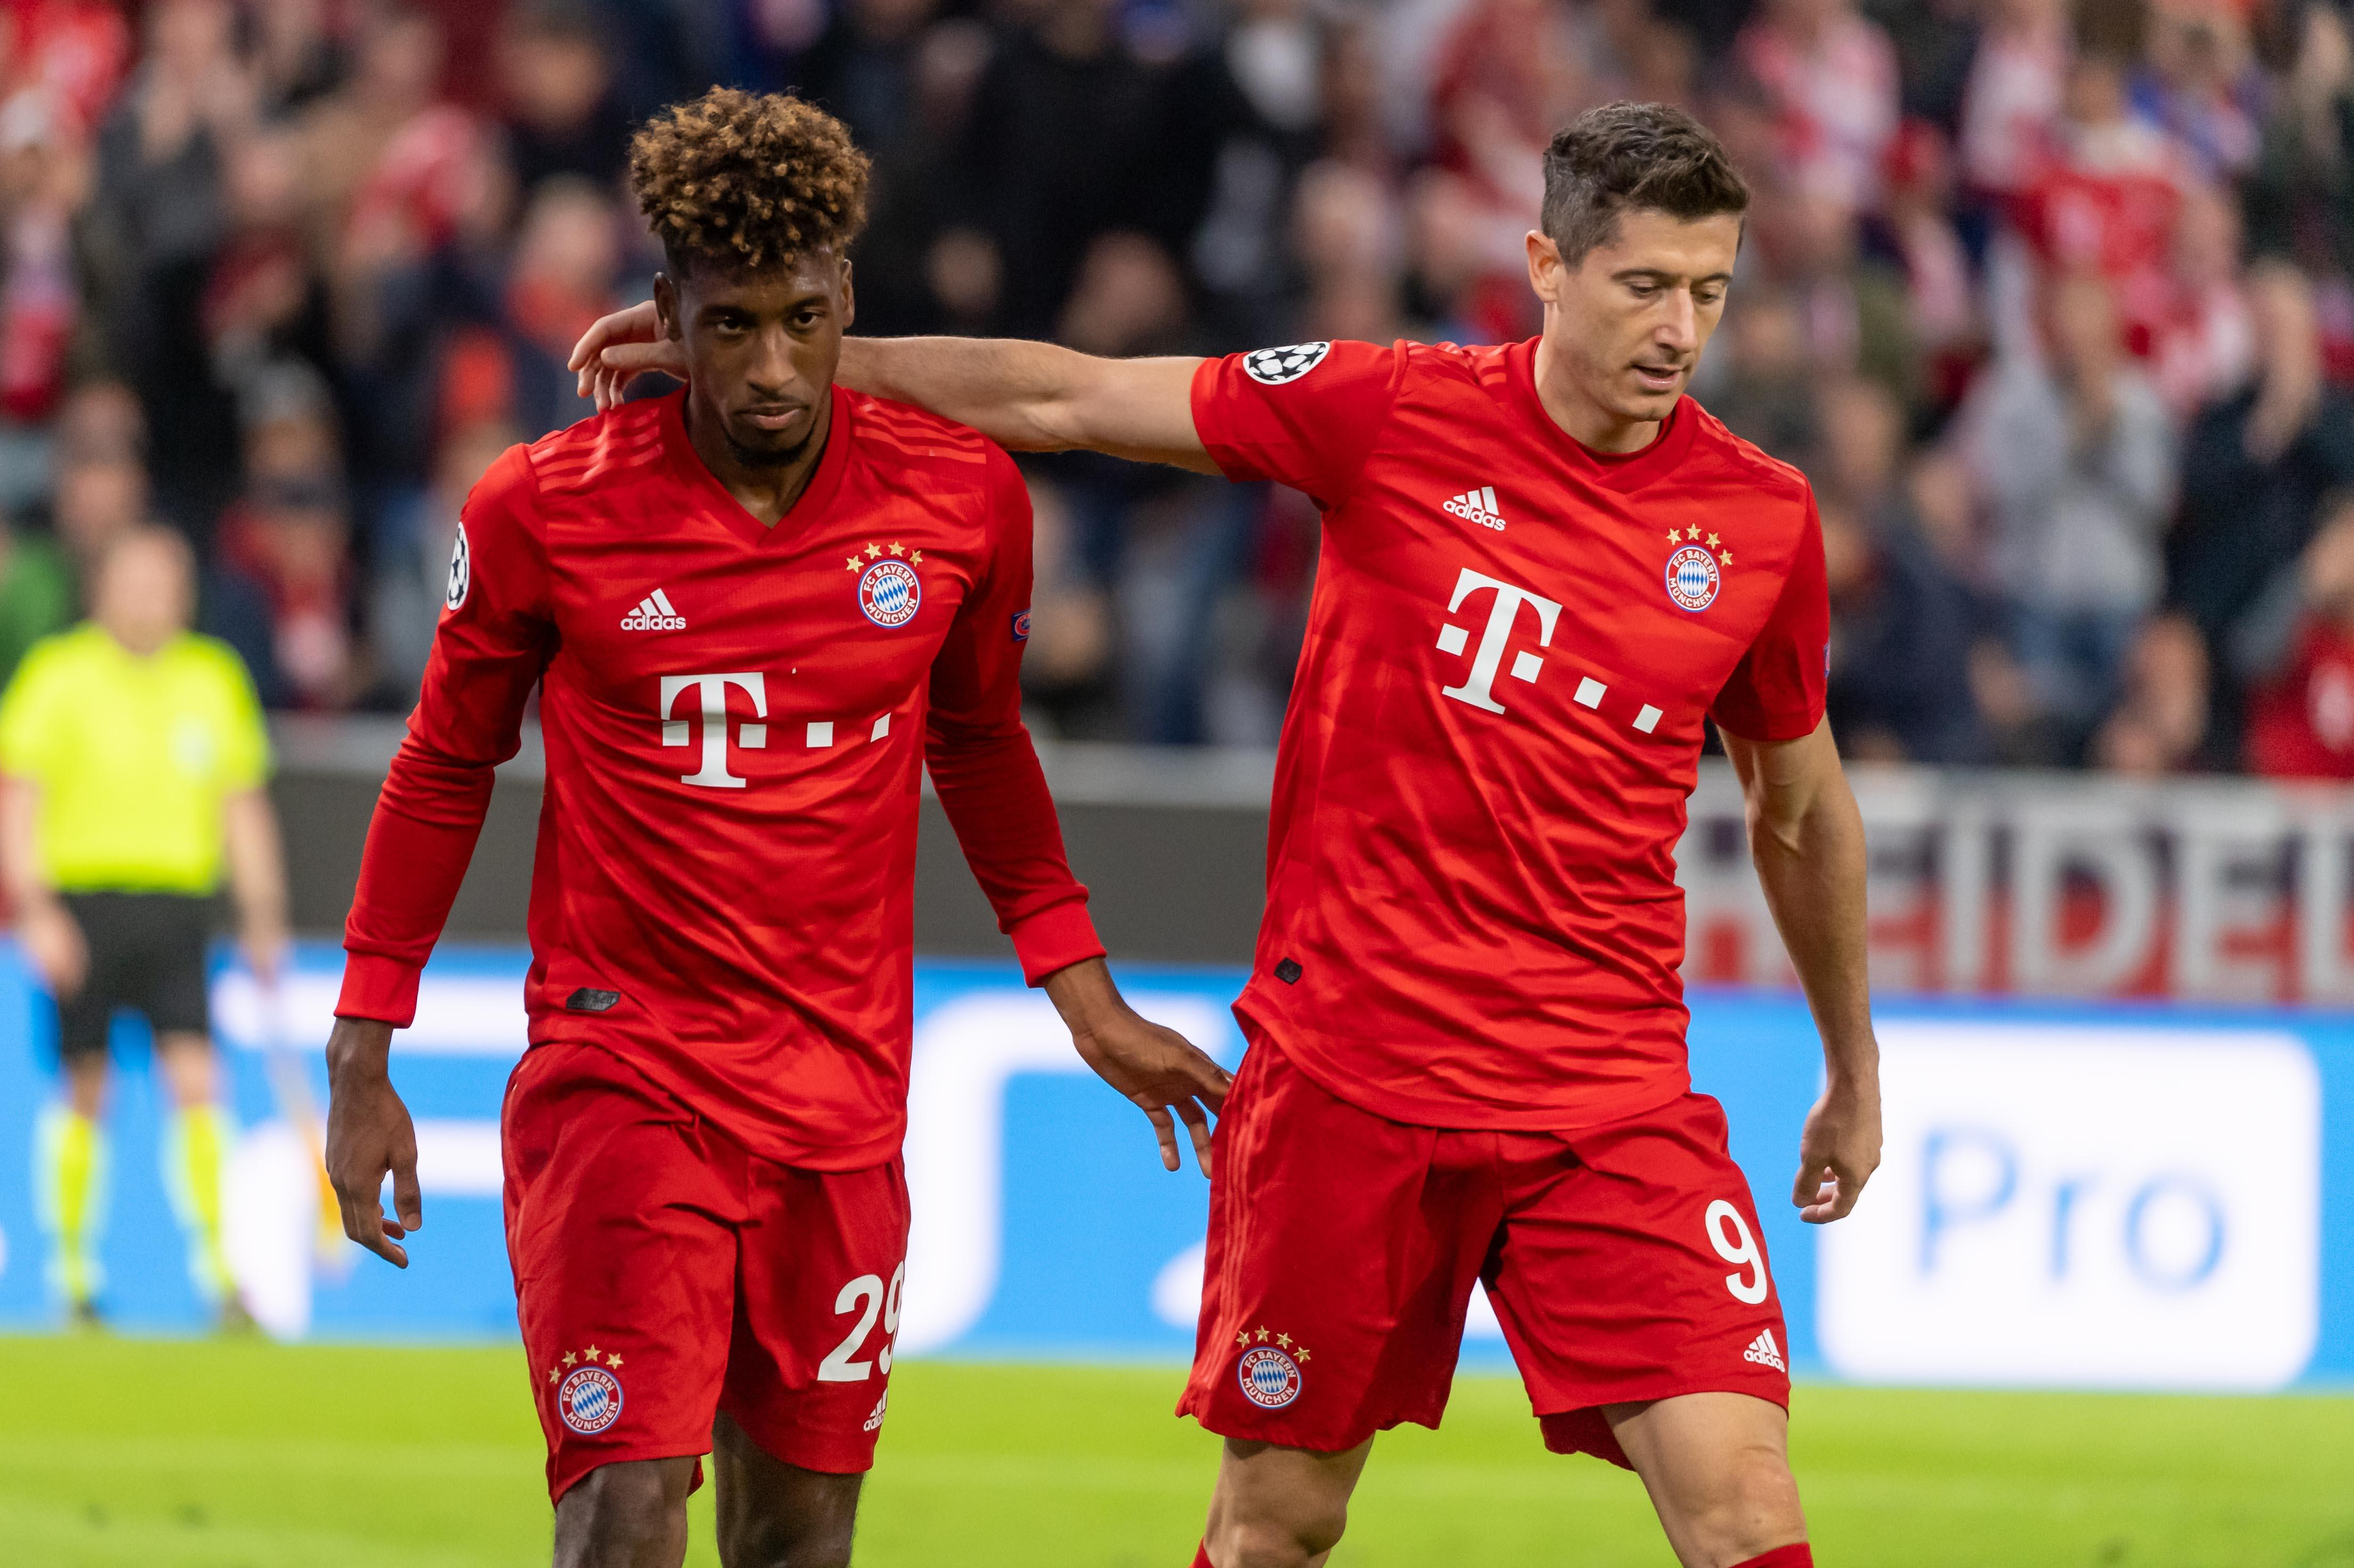 Football - Ligue des champions - Ligue des champions : Bayern-Tottenham en direct